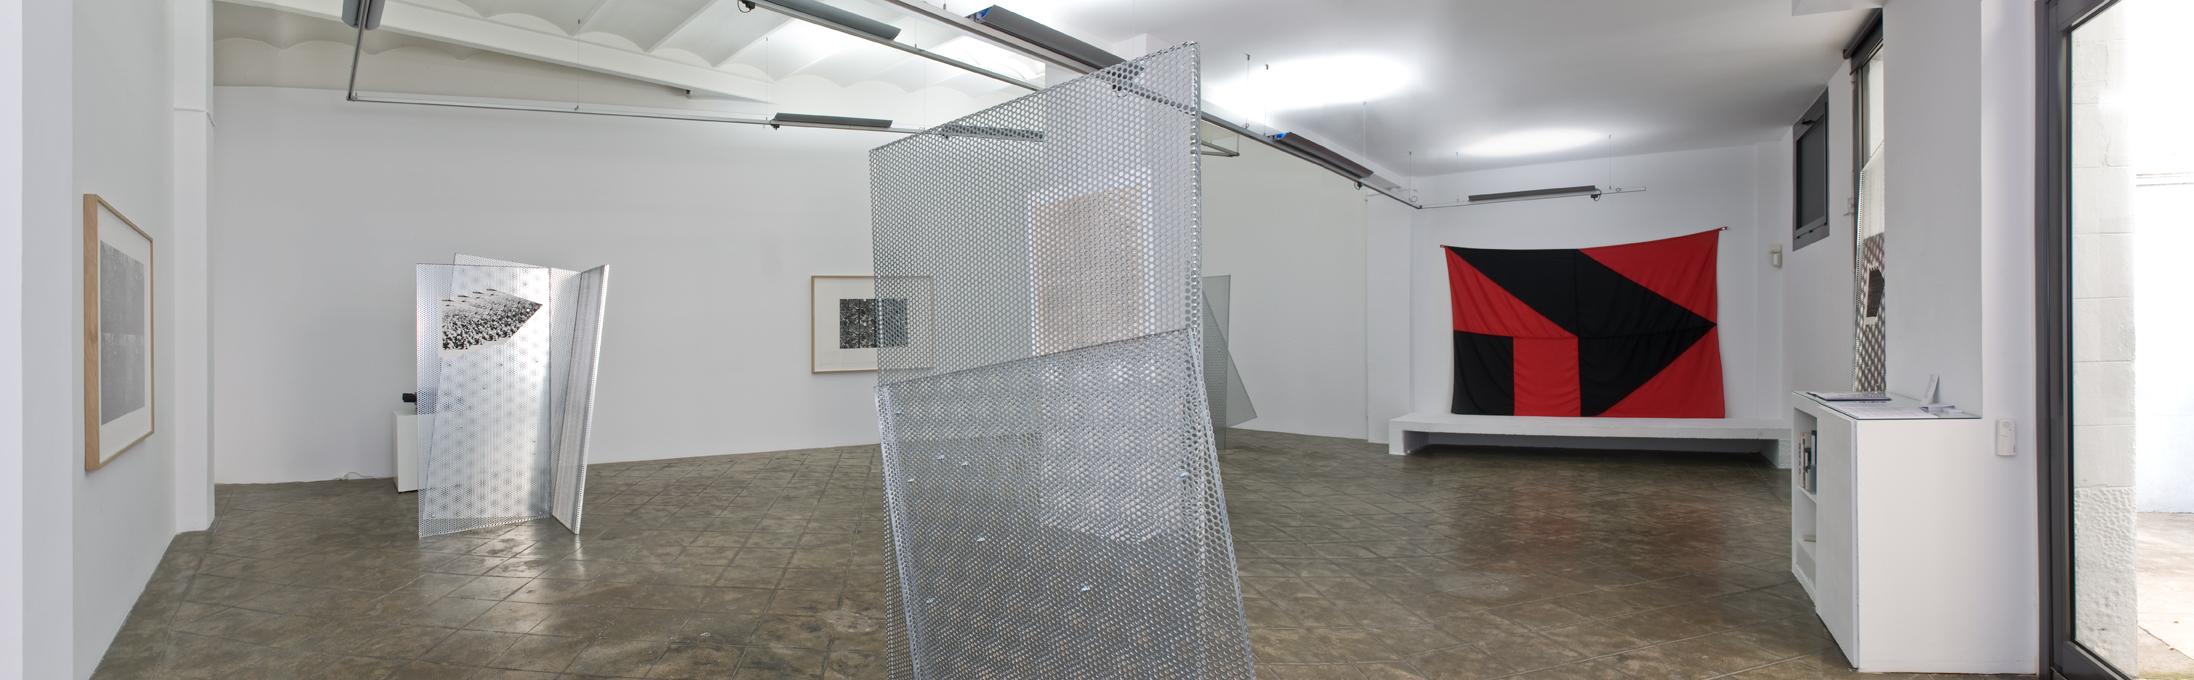 Installation view: Asier Mendizabal, 2012, ProjecteSD, Barcelona |  | ProjecteSD